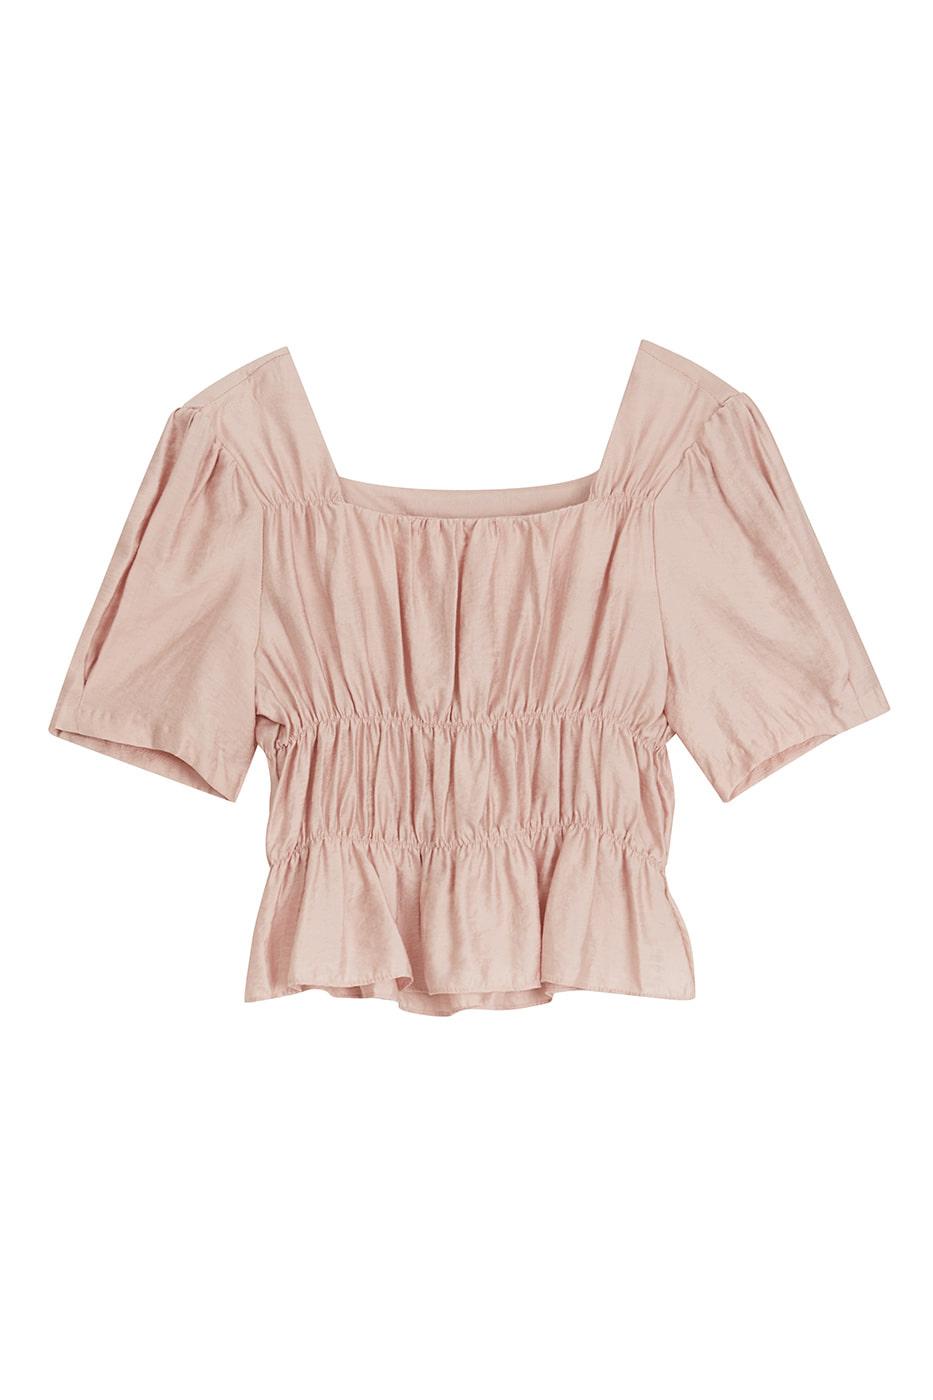 Rosy Shine shirred blouse